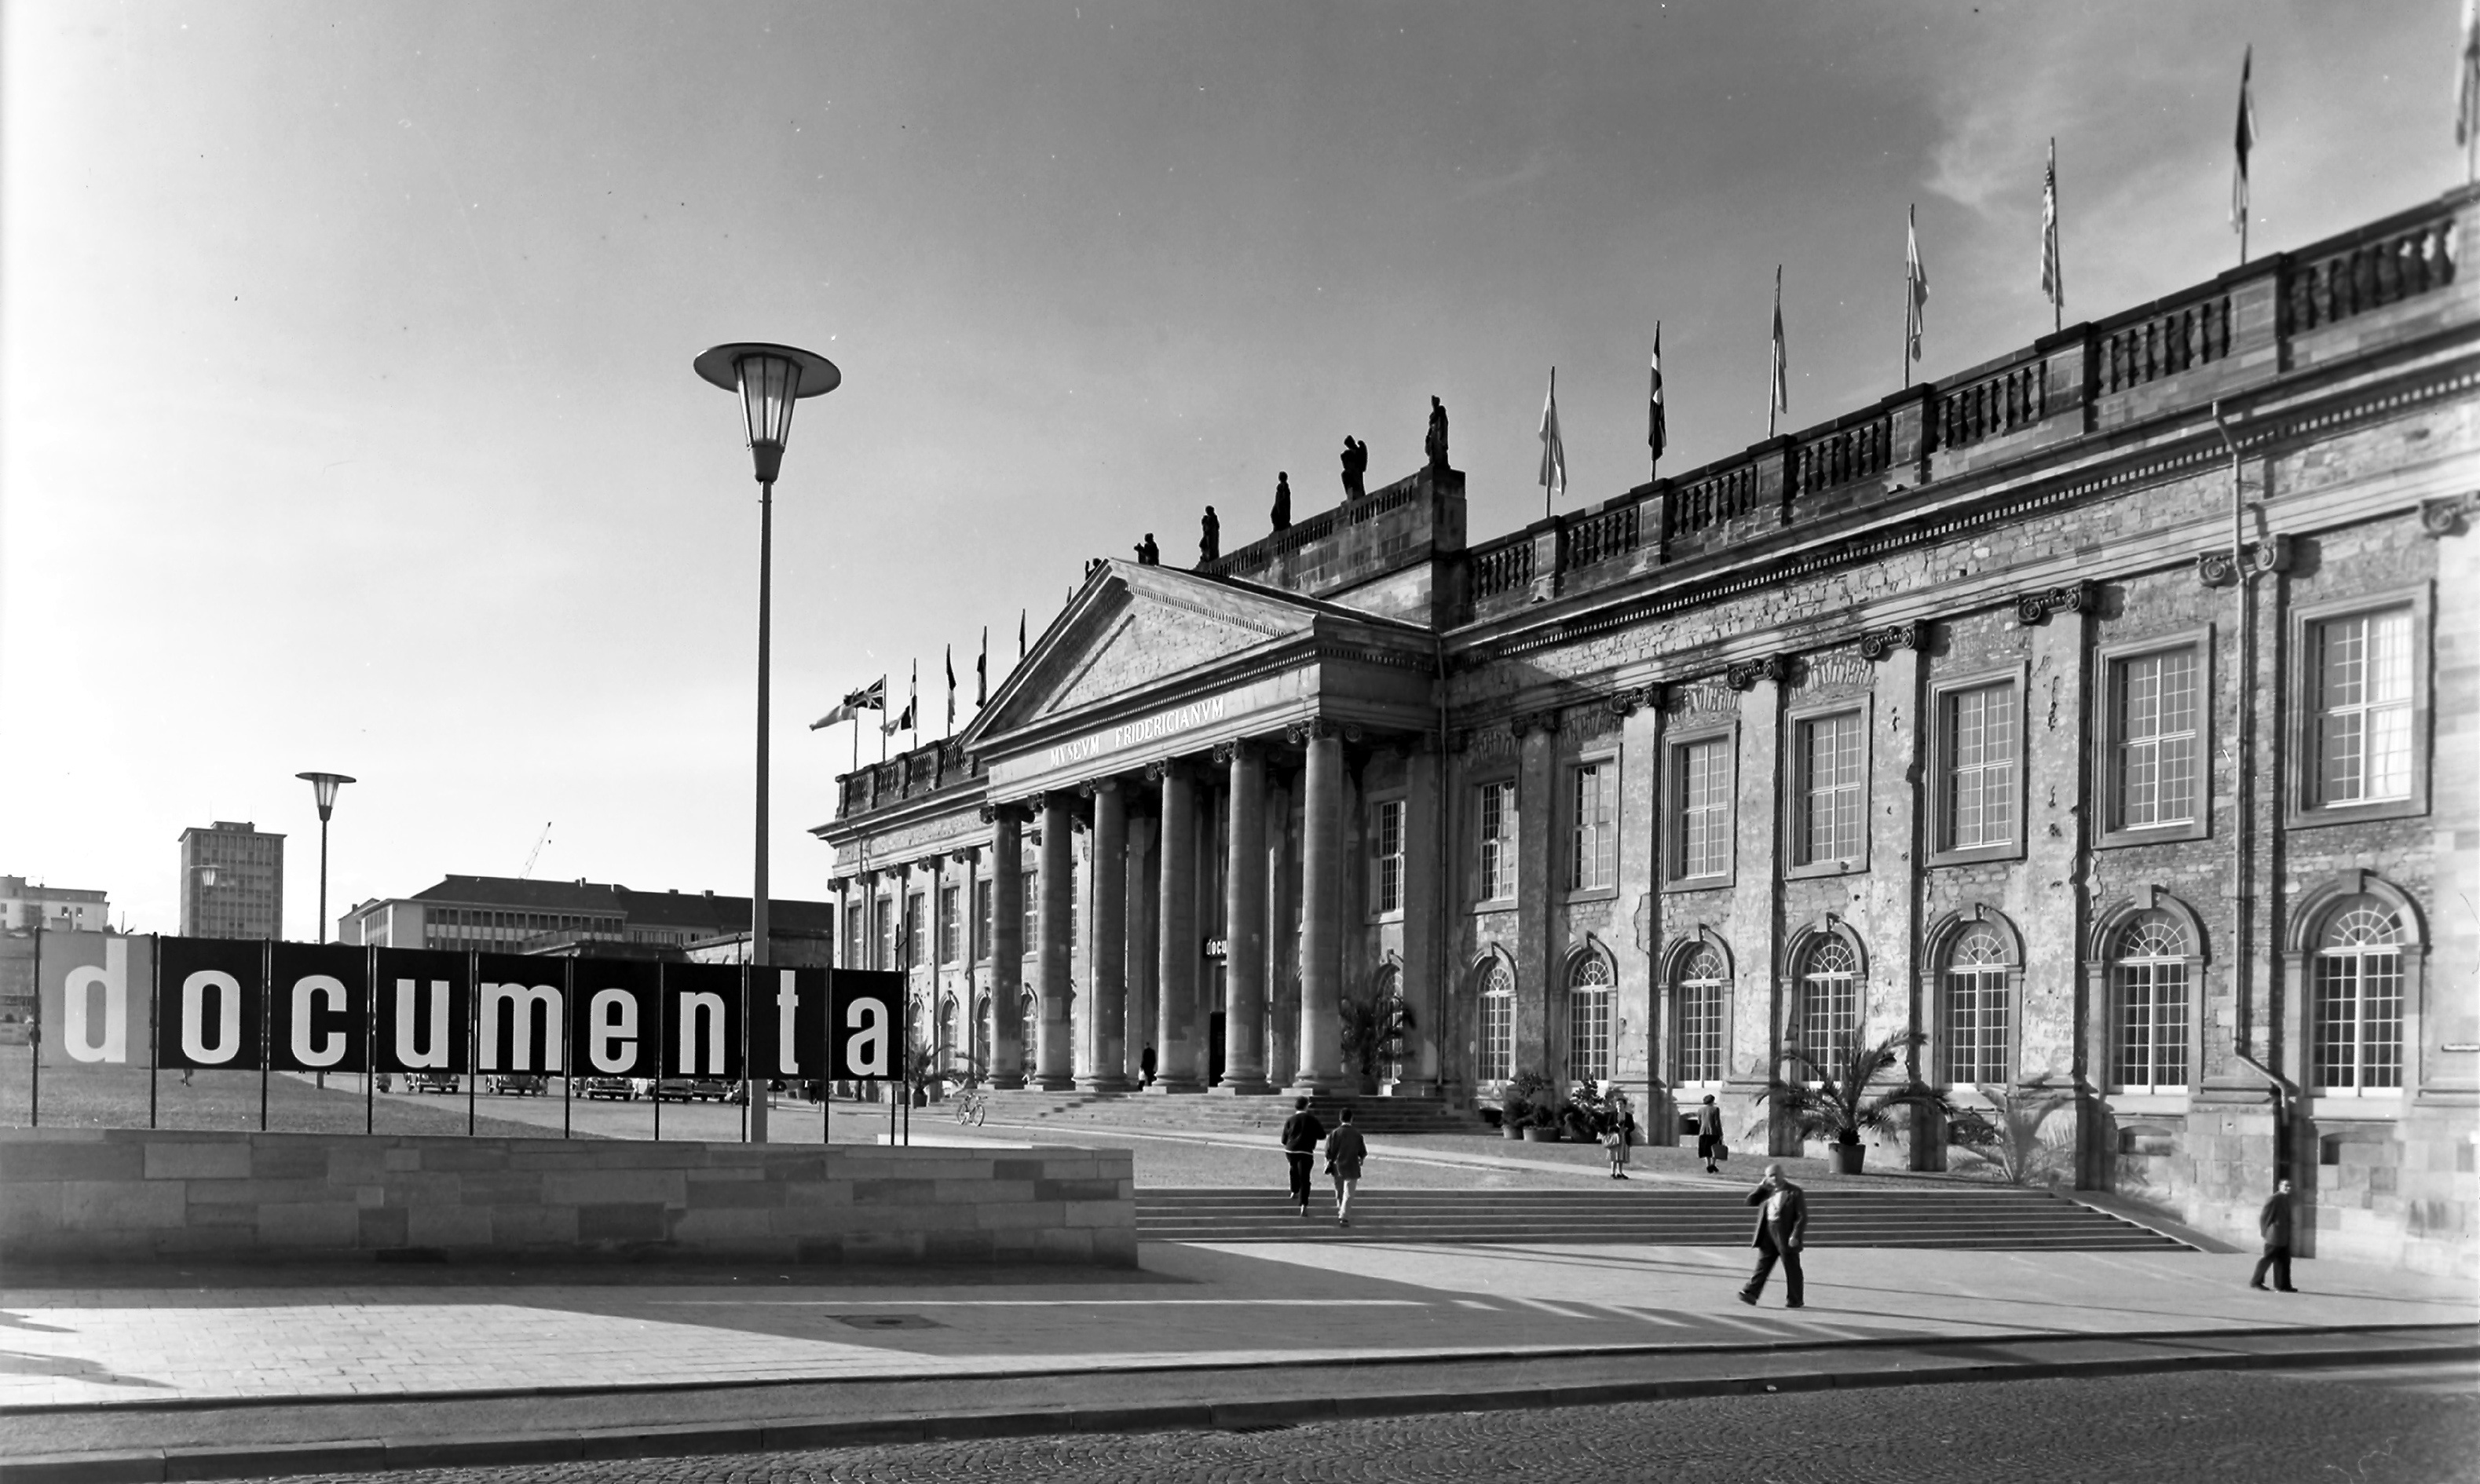 documenta 1, 1955, Artistick Director : Arnold Bode.Fridericianum Kassel. Foto: Günther Becker, documenta Archiv